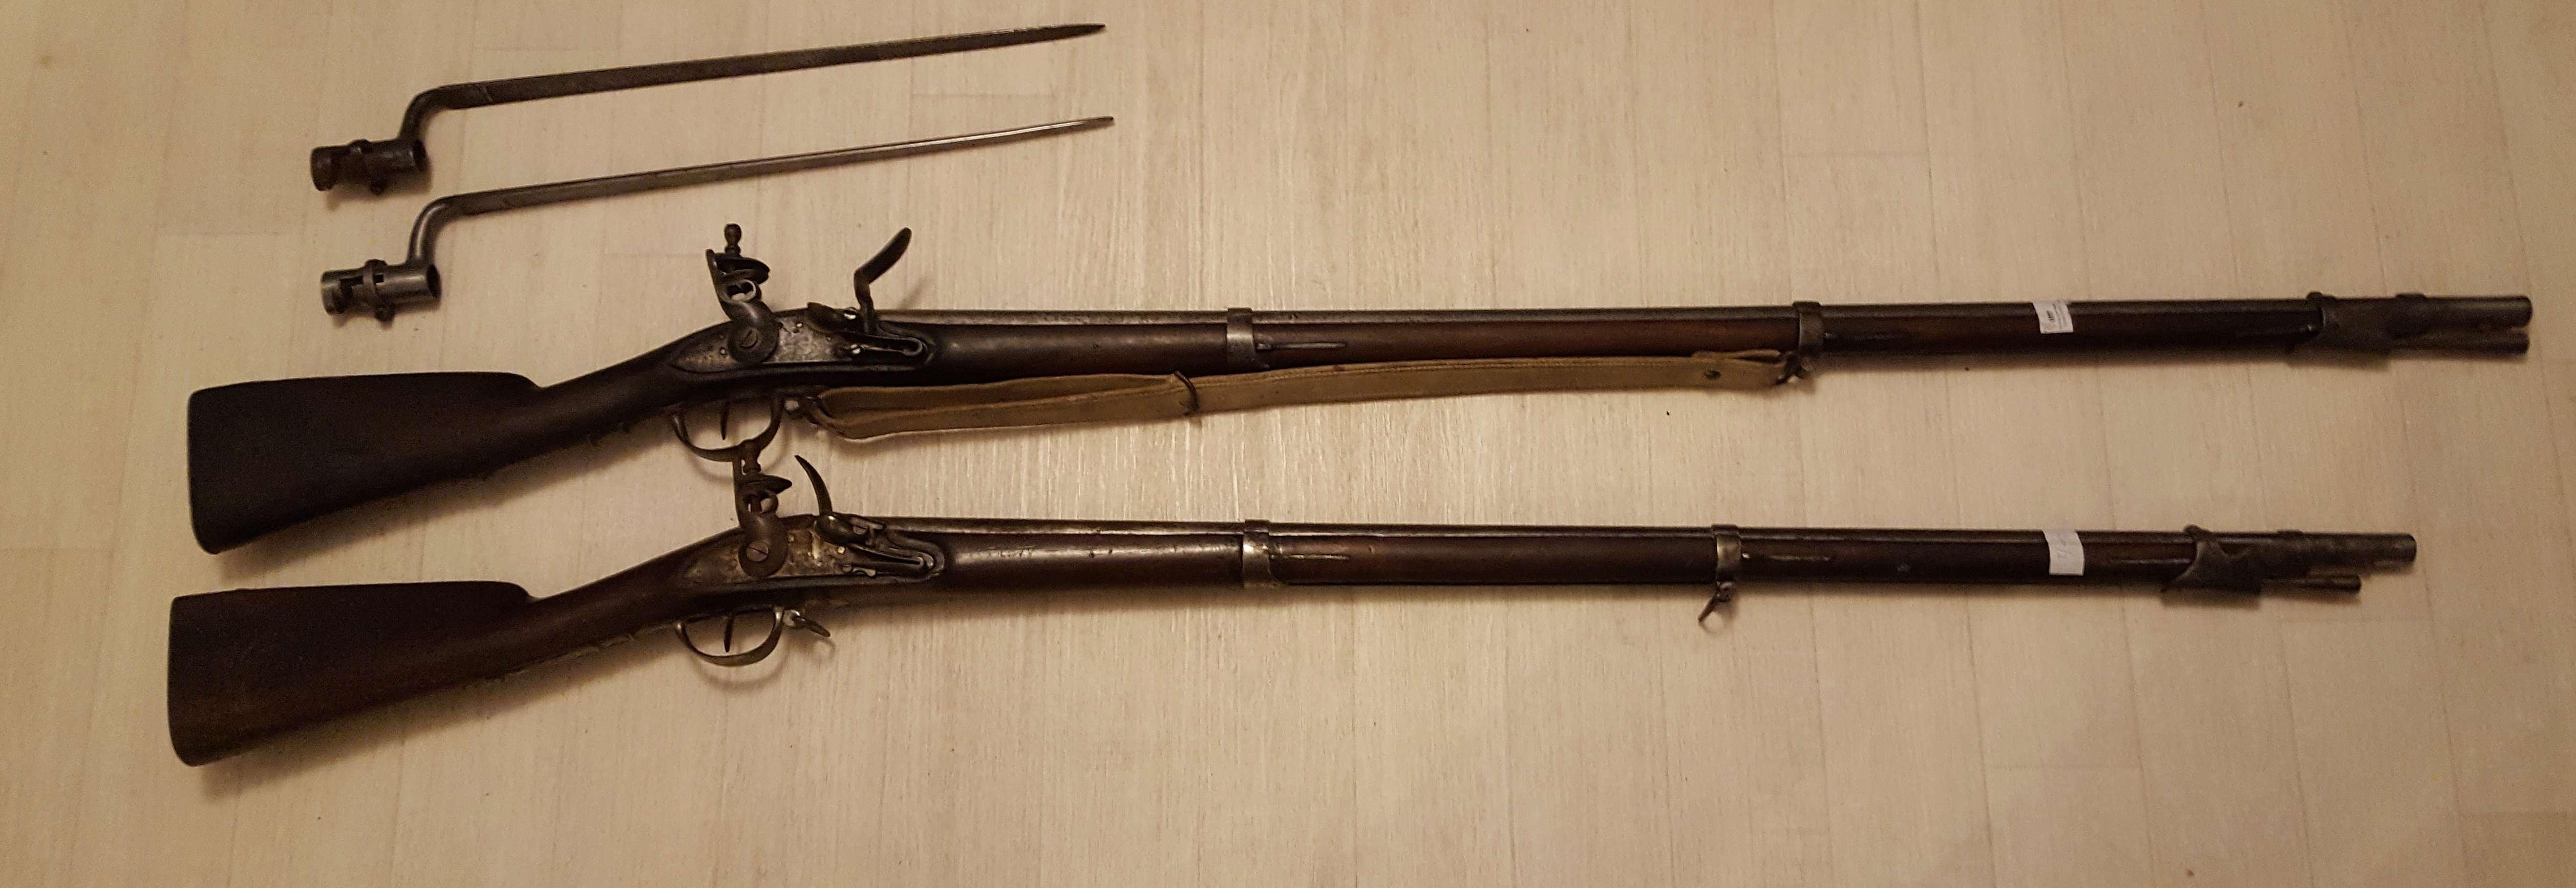 Sauvetage de 2 fusils an IX 20180514